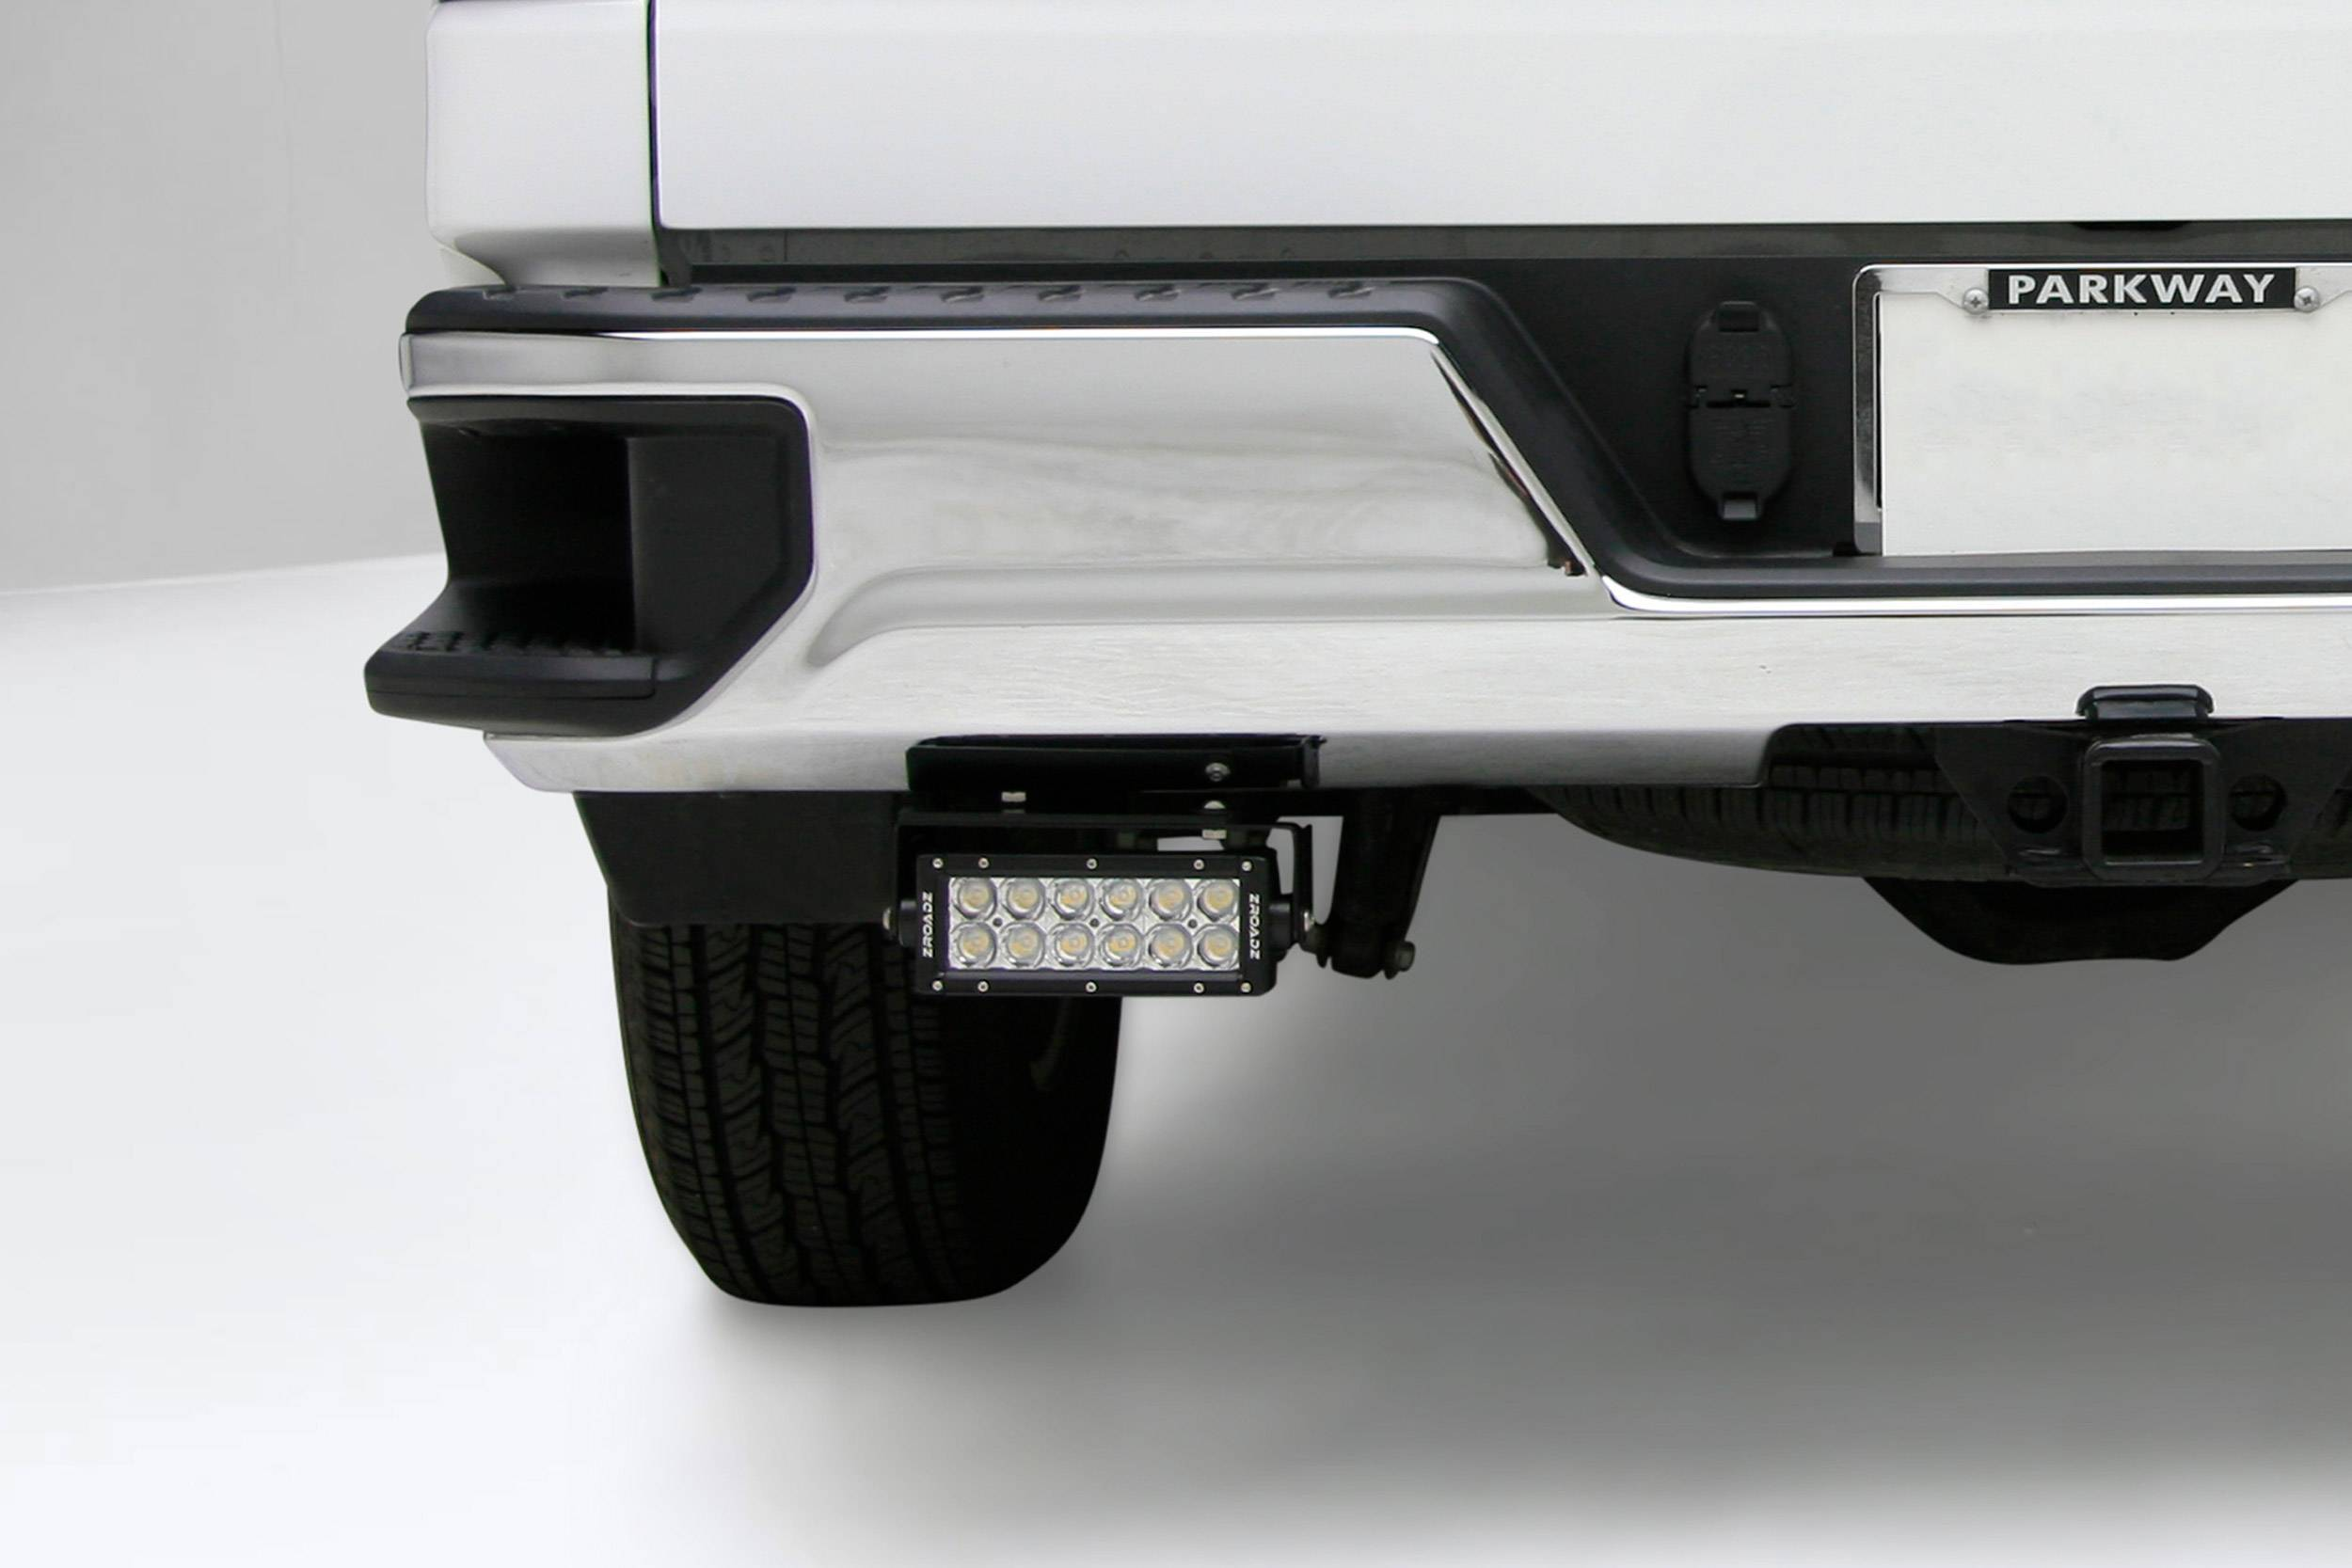 ZROADZ - 2019-2021 Silverado, Sierra 1500 Rear Bumper LED Kit with (2) 6 Inch LED Straight Double Row Light Bars - PN #Z382182-KIT